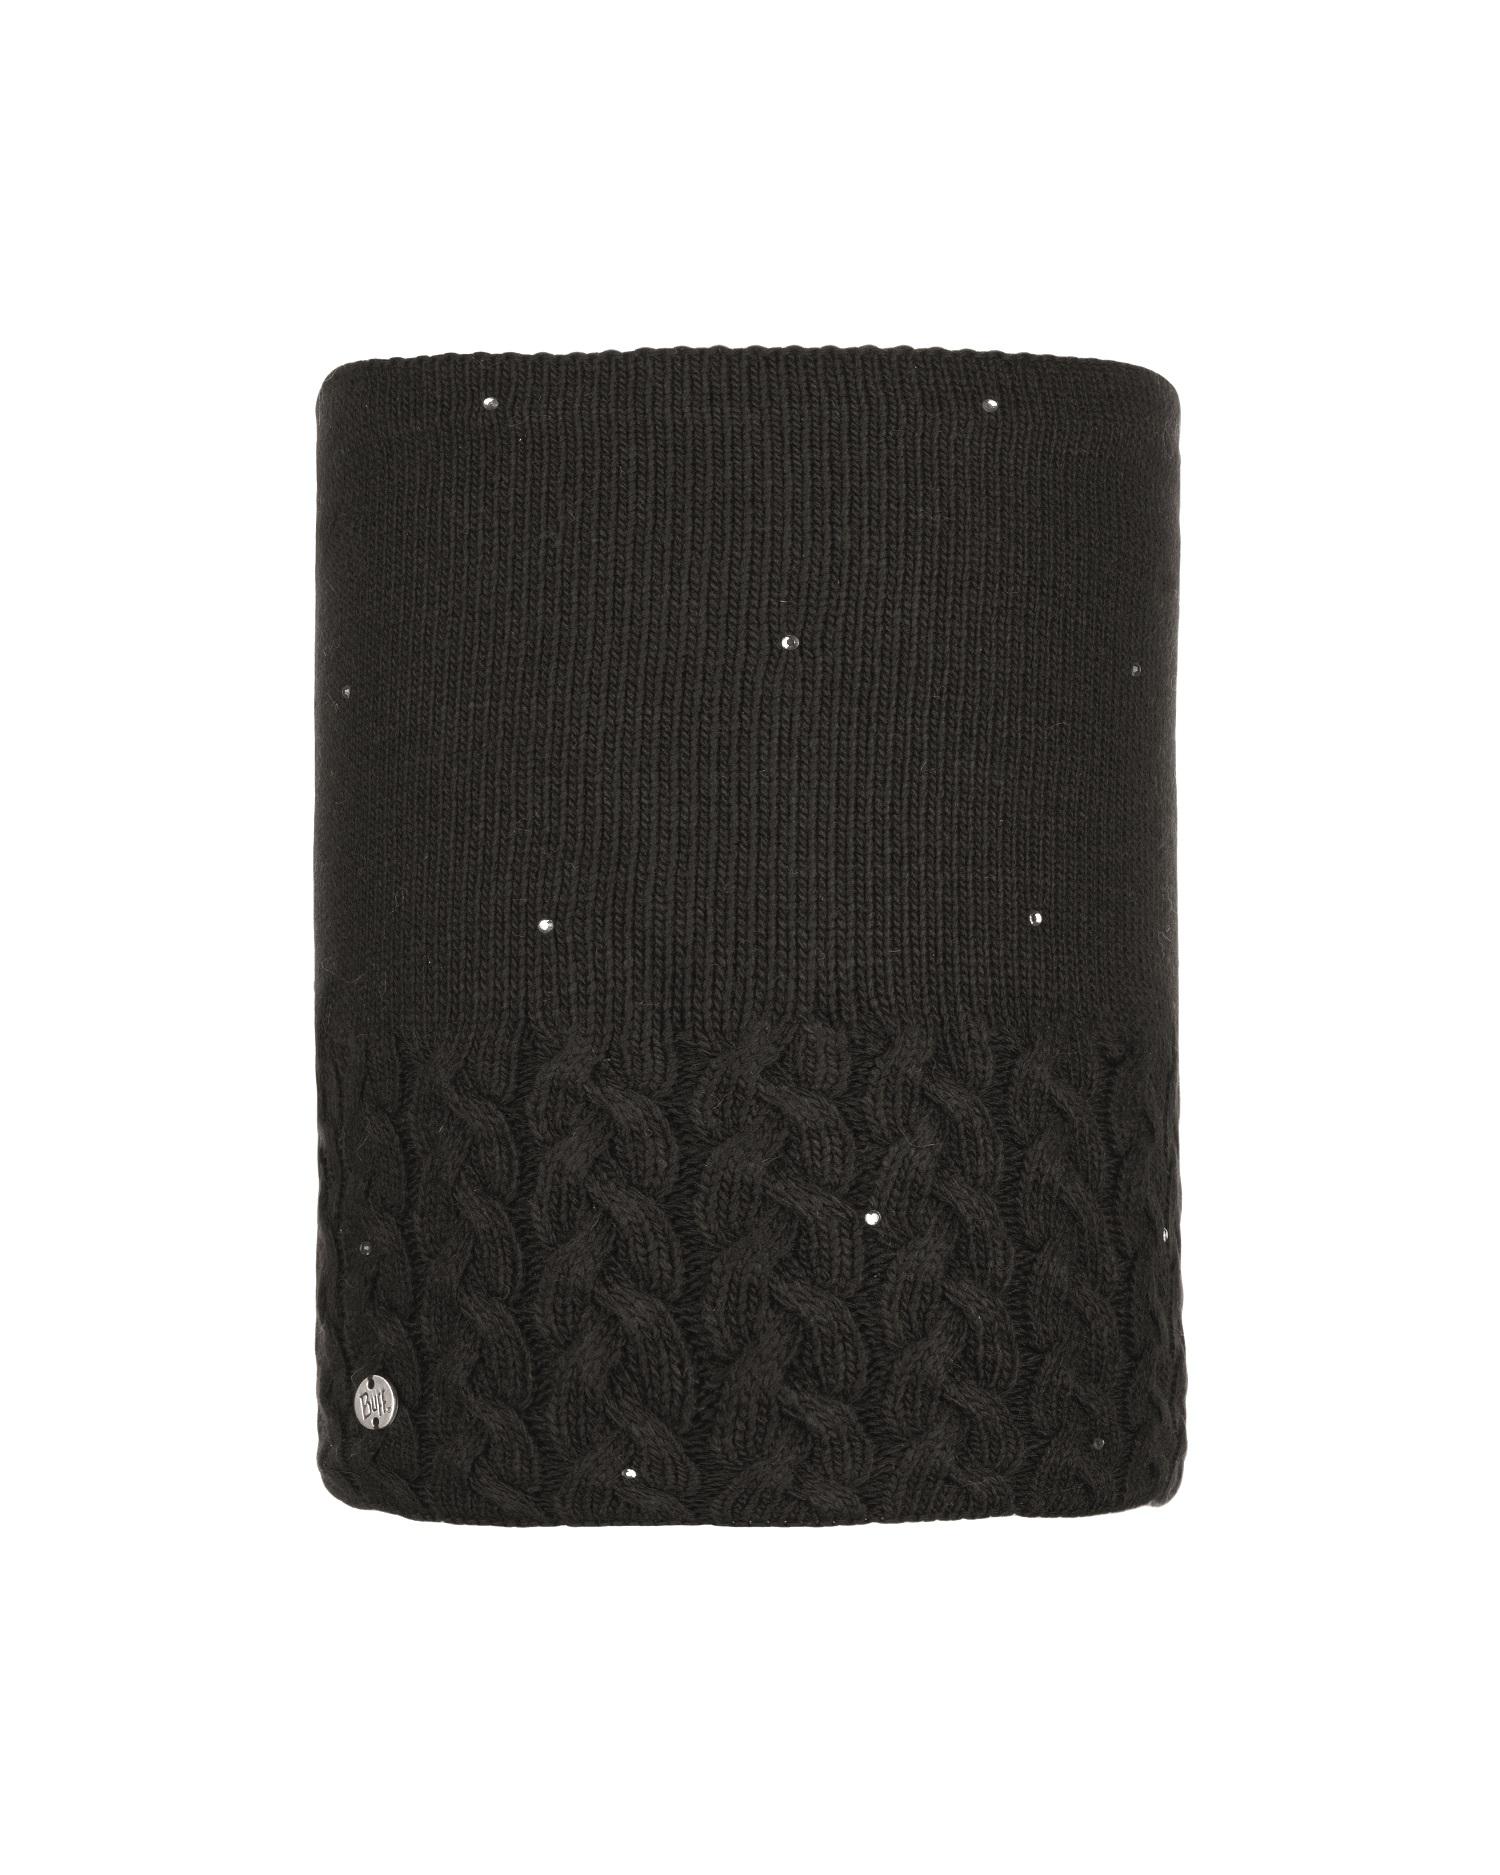 Купить Шарф BUFF KNITTED & POLAR NECKWARMER ELIE BLACK Банданы и шарфы Buff ® 1377338